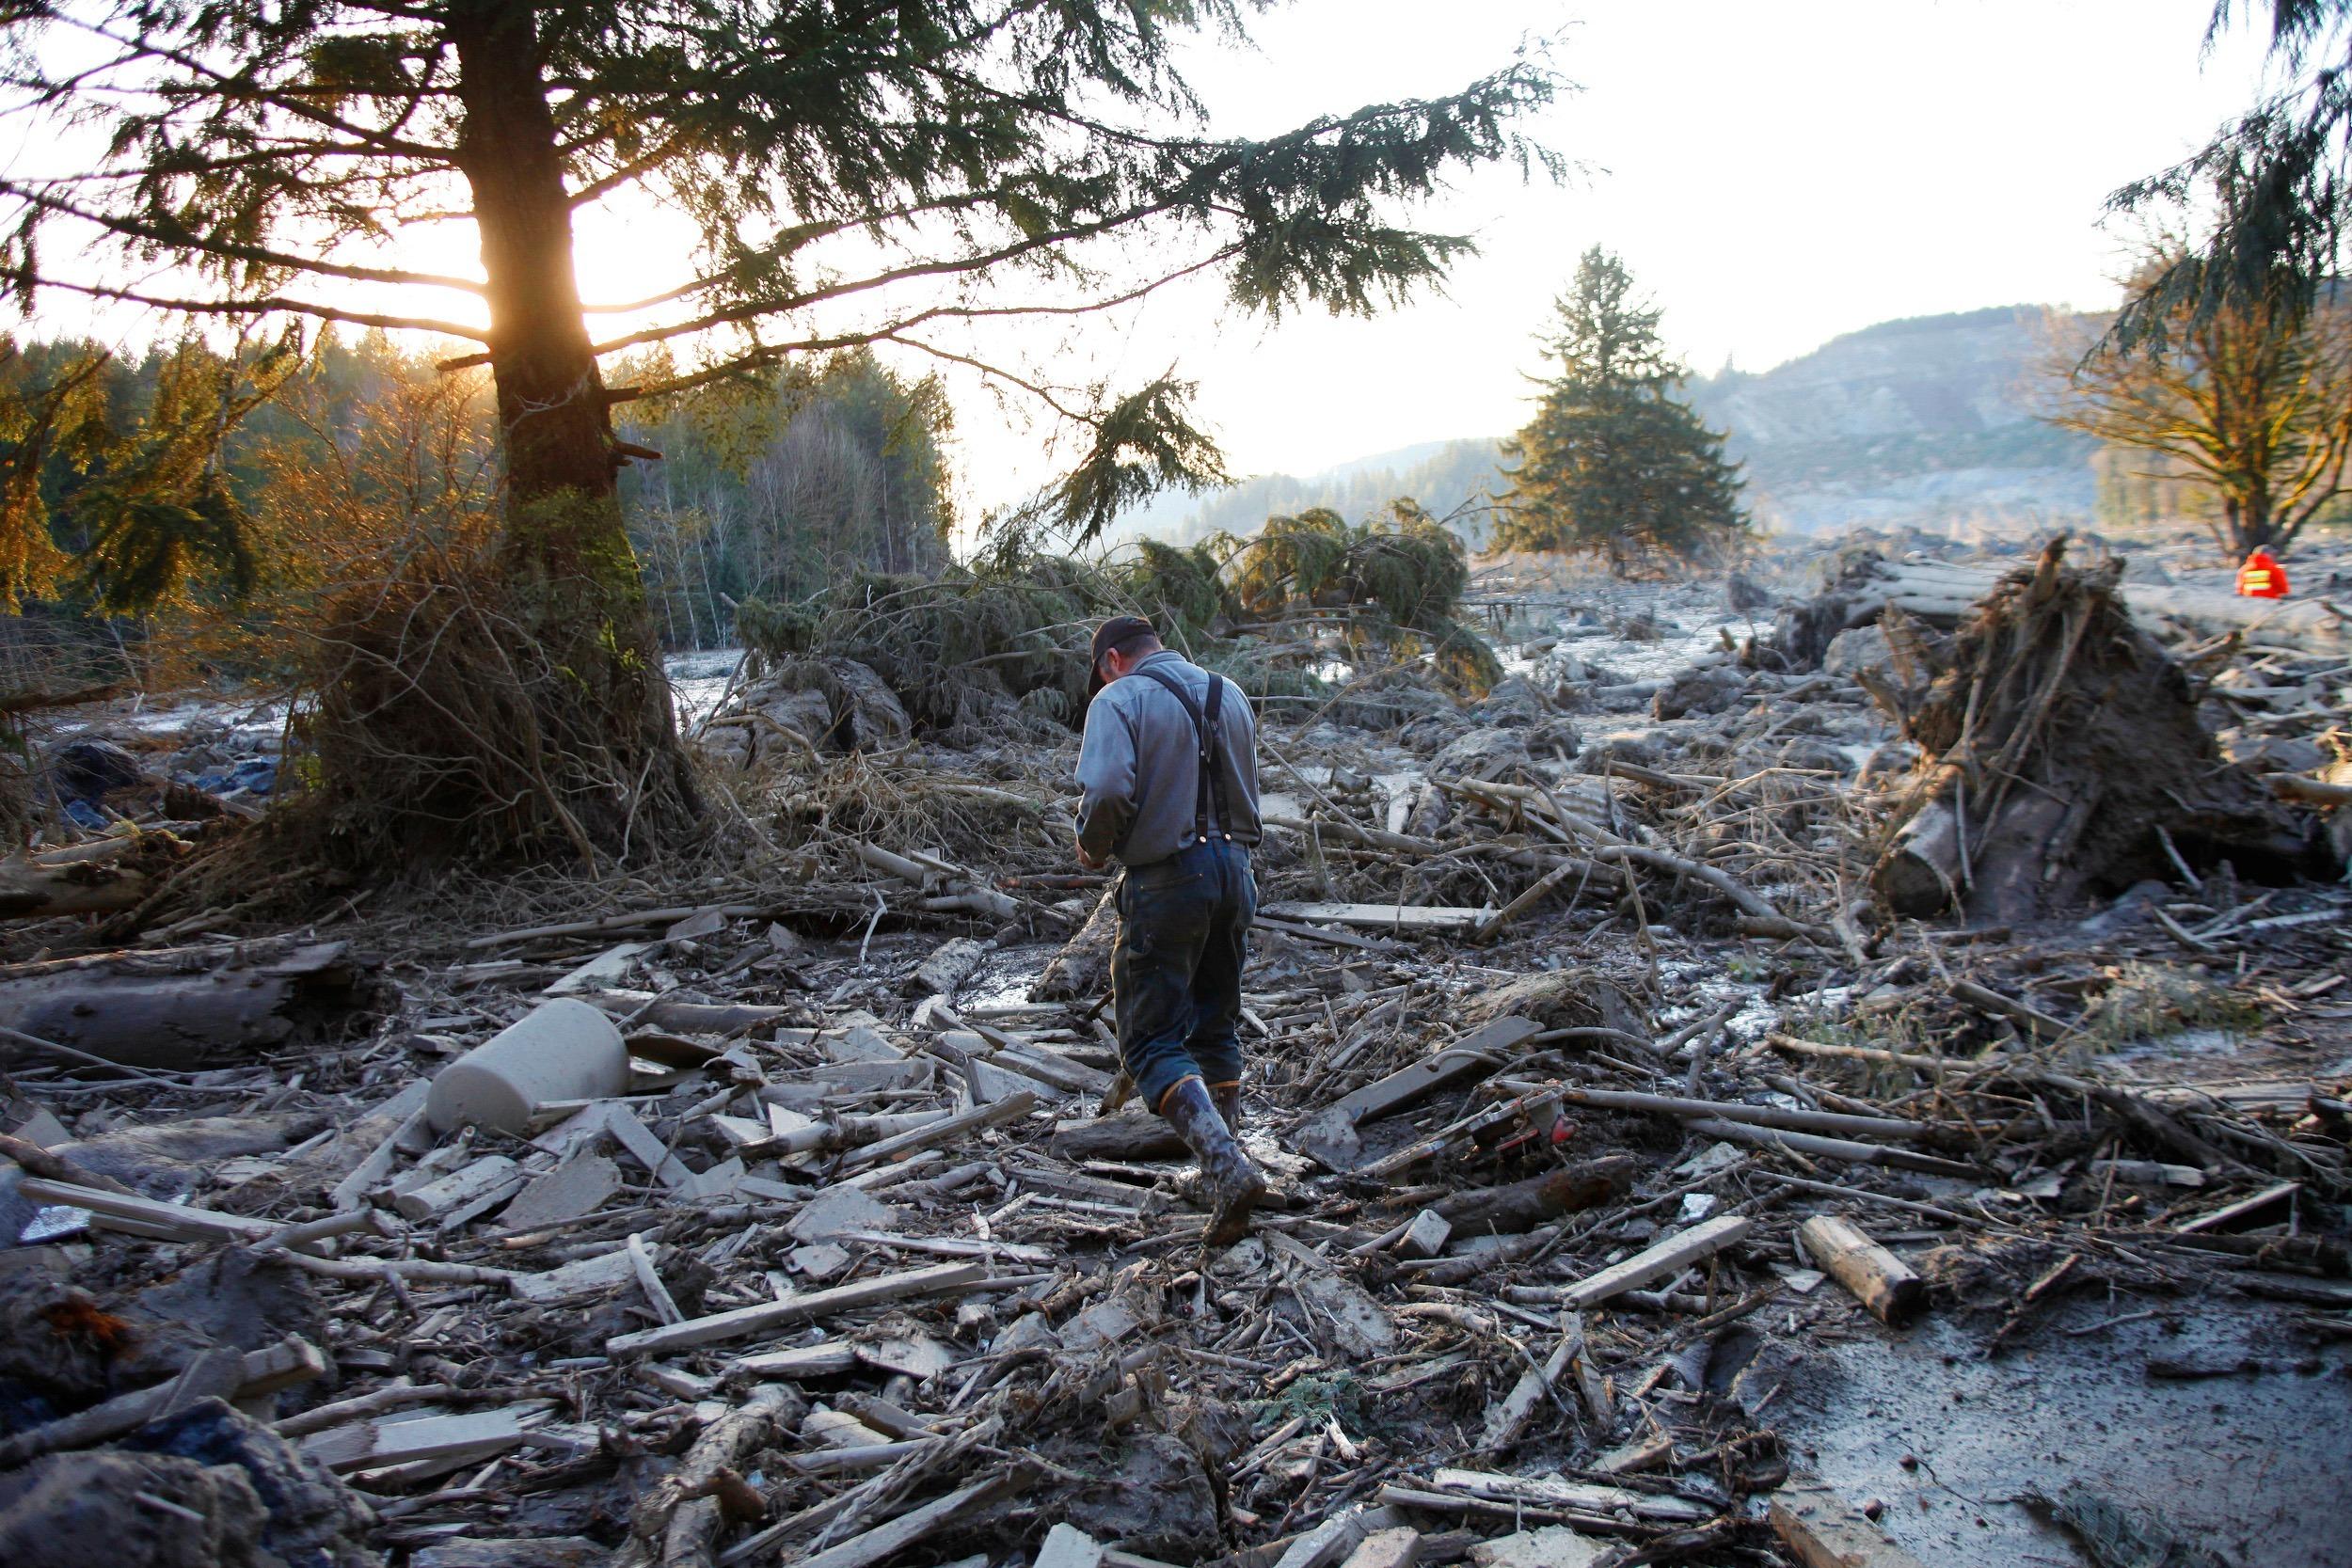 Steve Skaglund walks across the rubble on the east side of Saturday's fatal mudslide near Oso, Washington